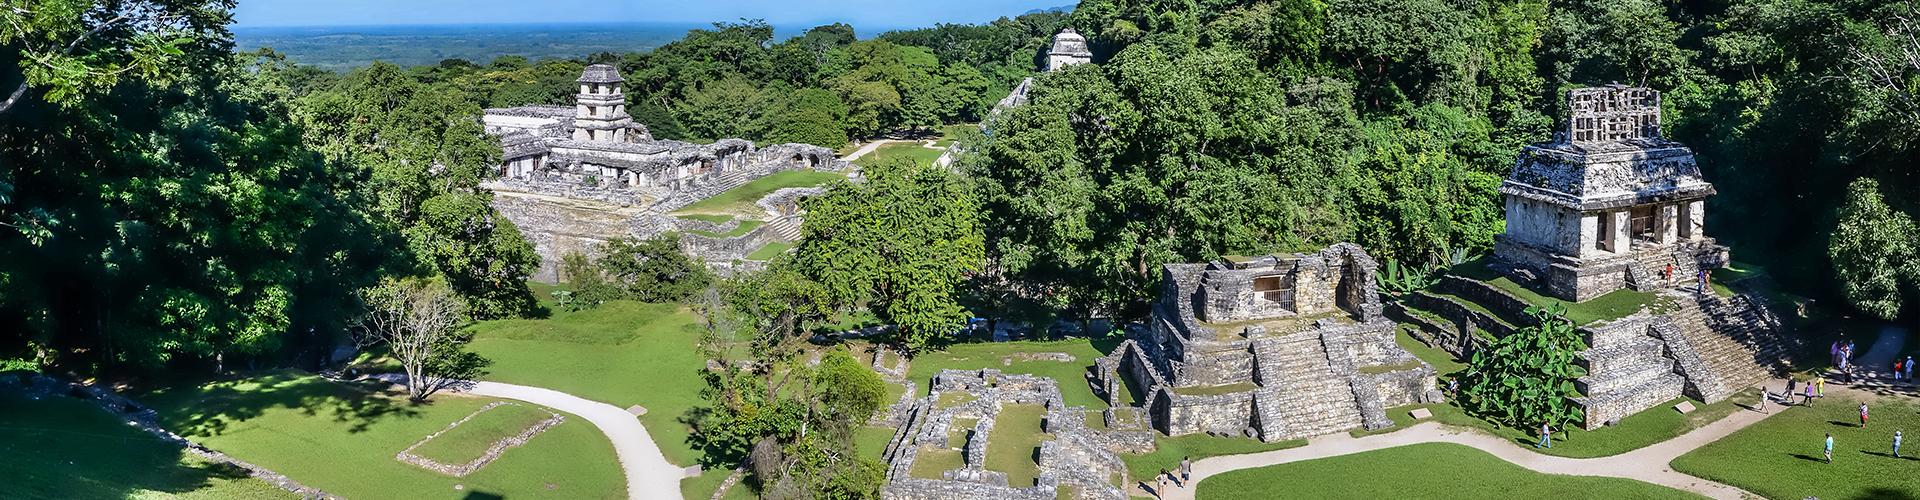 Complete Central America